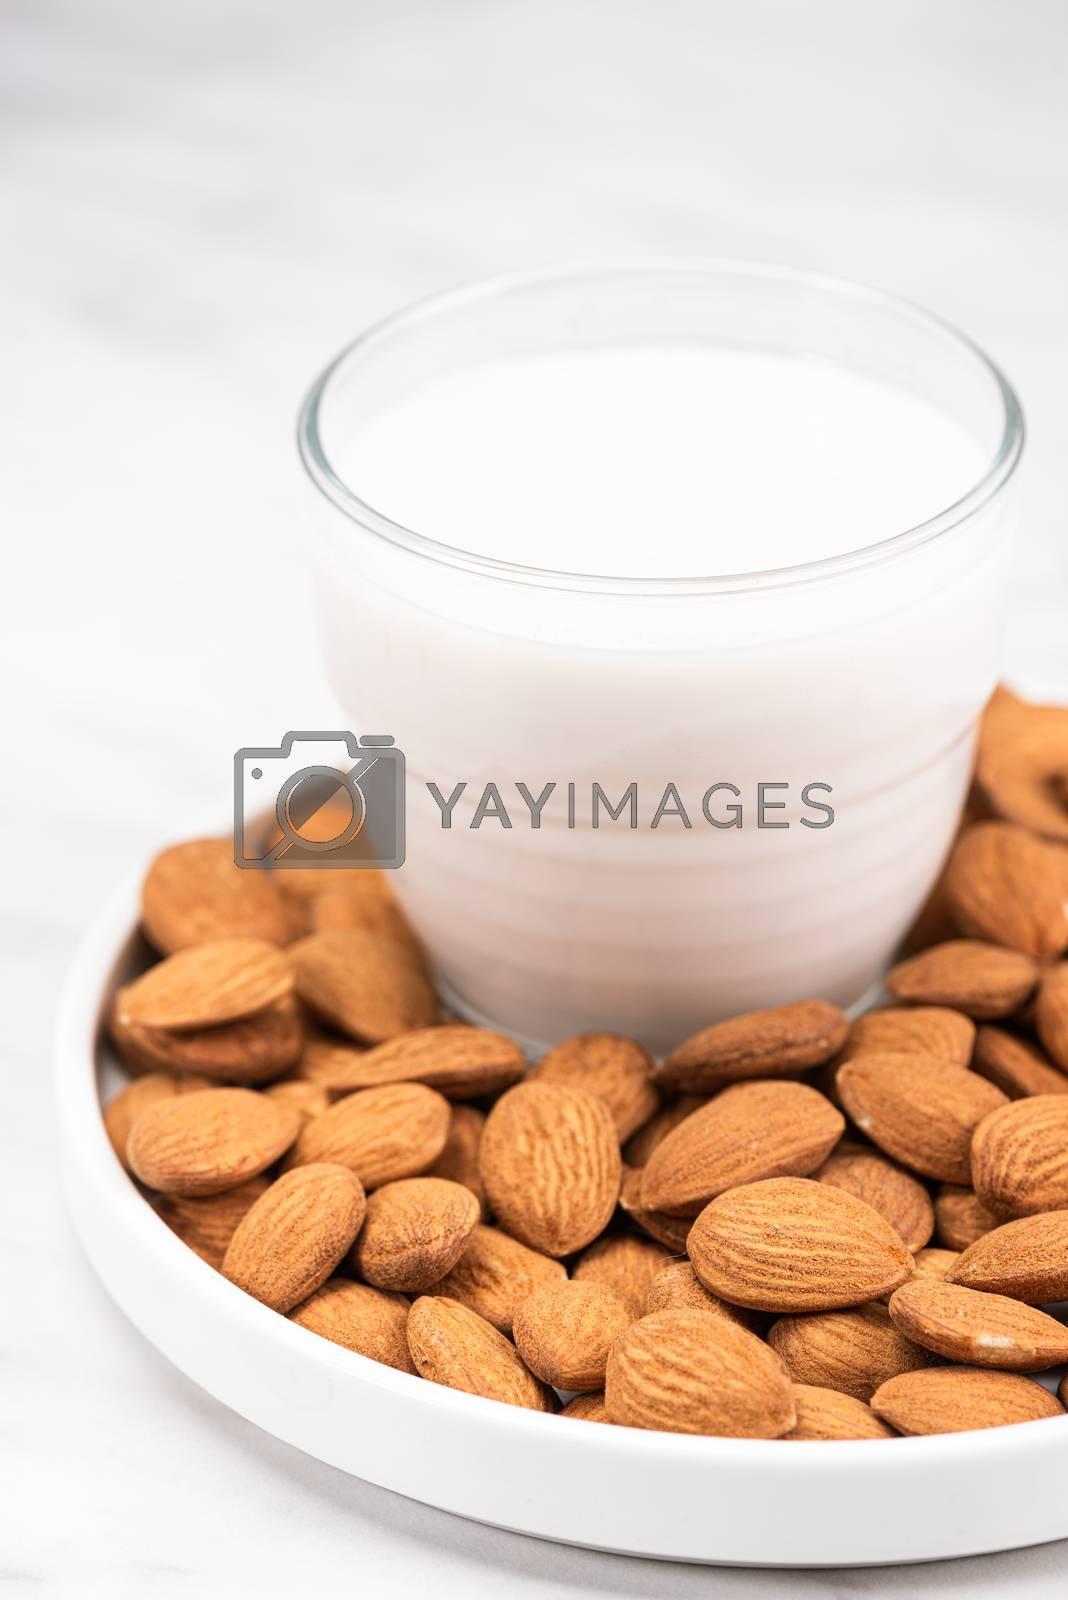 Almond Milk. Alternative Non Dairy Oraganic Milk. Plant Based Food.